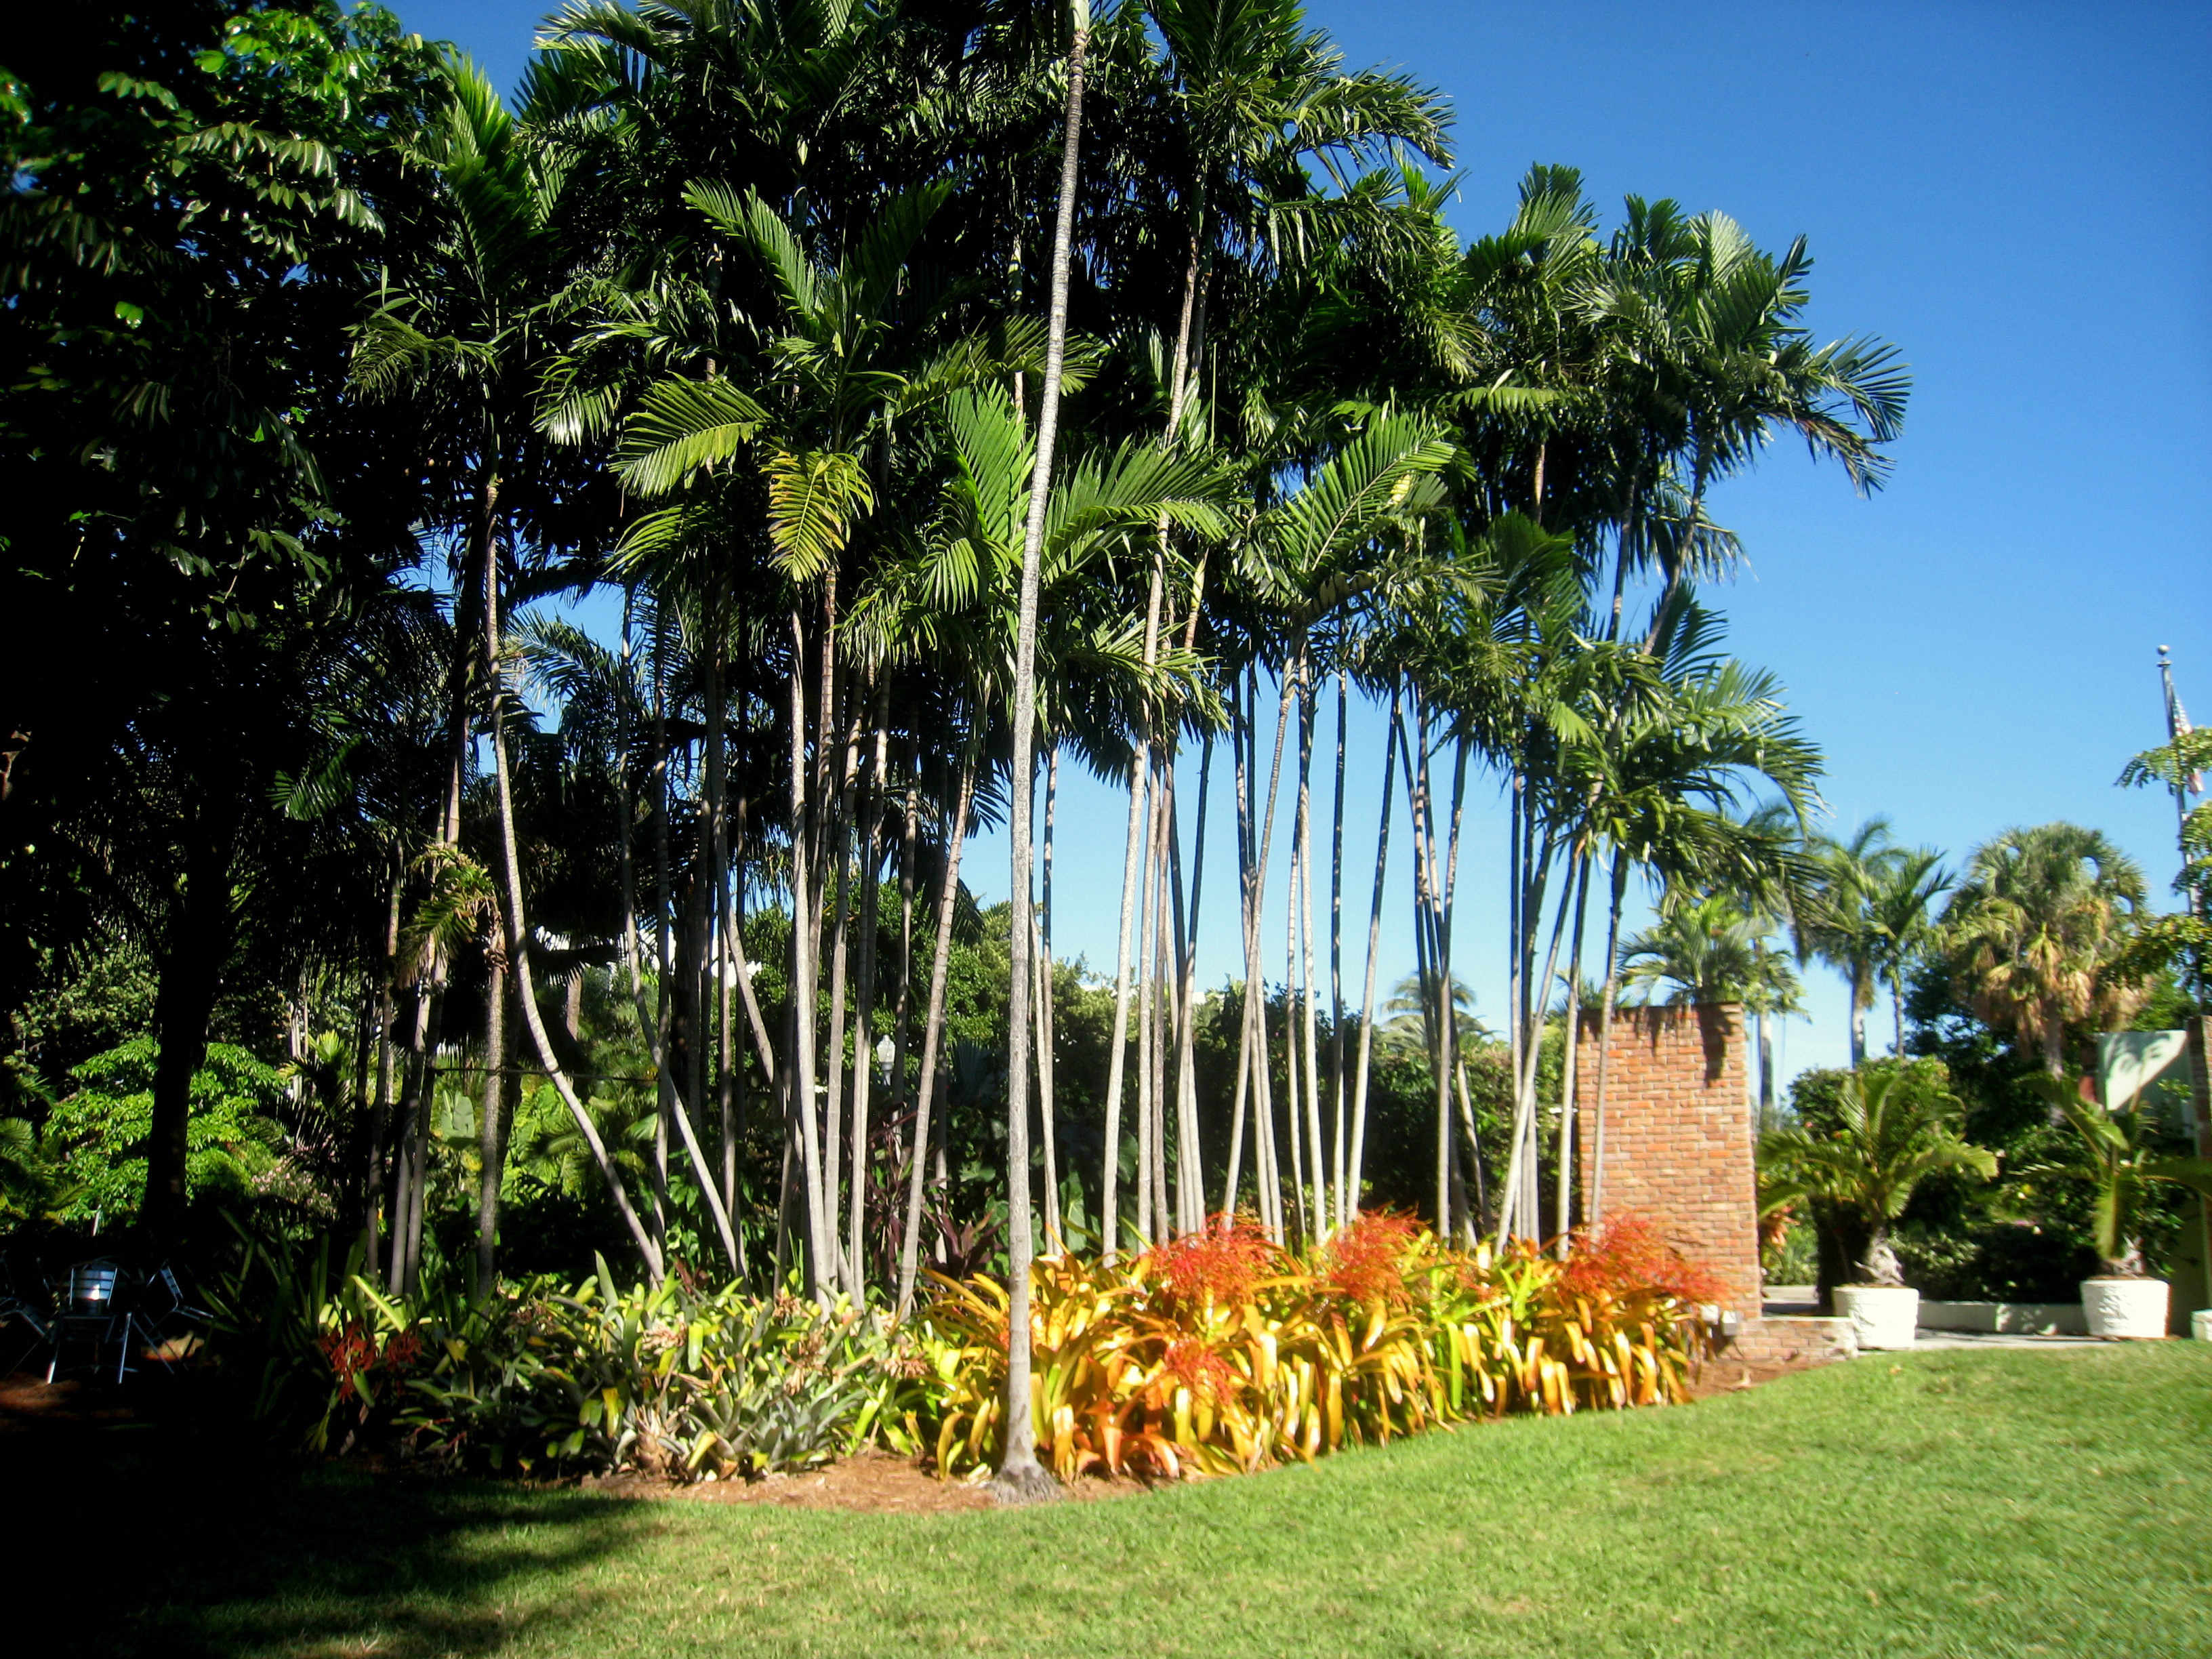 Merveilleux File:Miami Beach Botanical Garden   IMG 8020.JPG